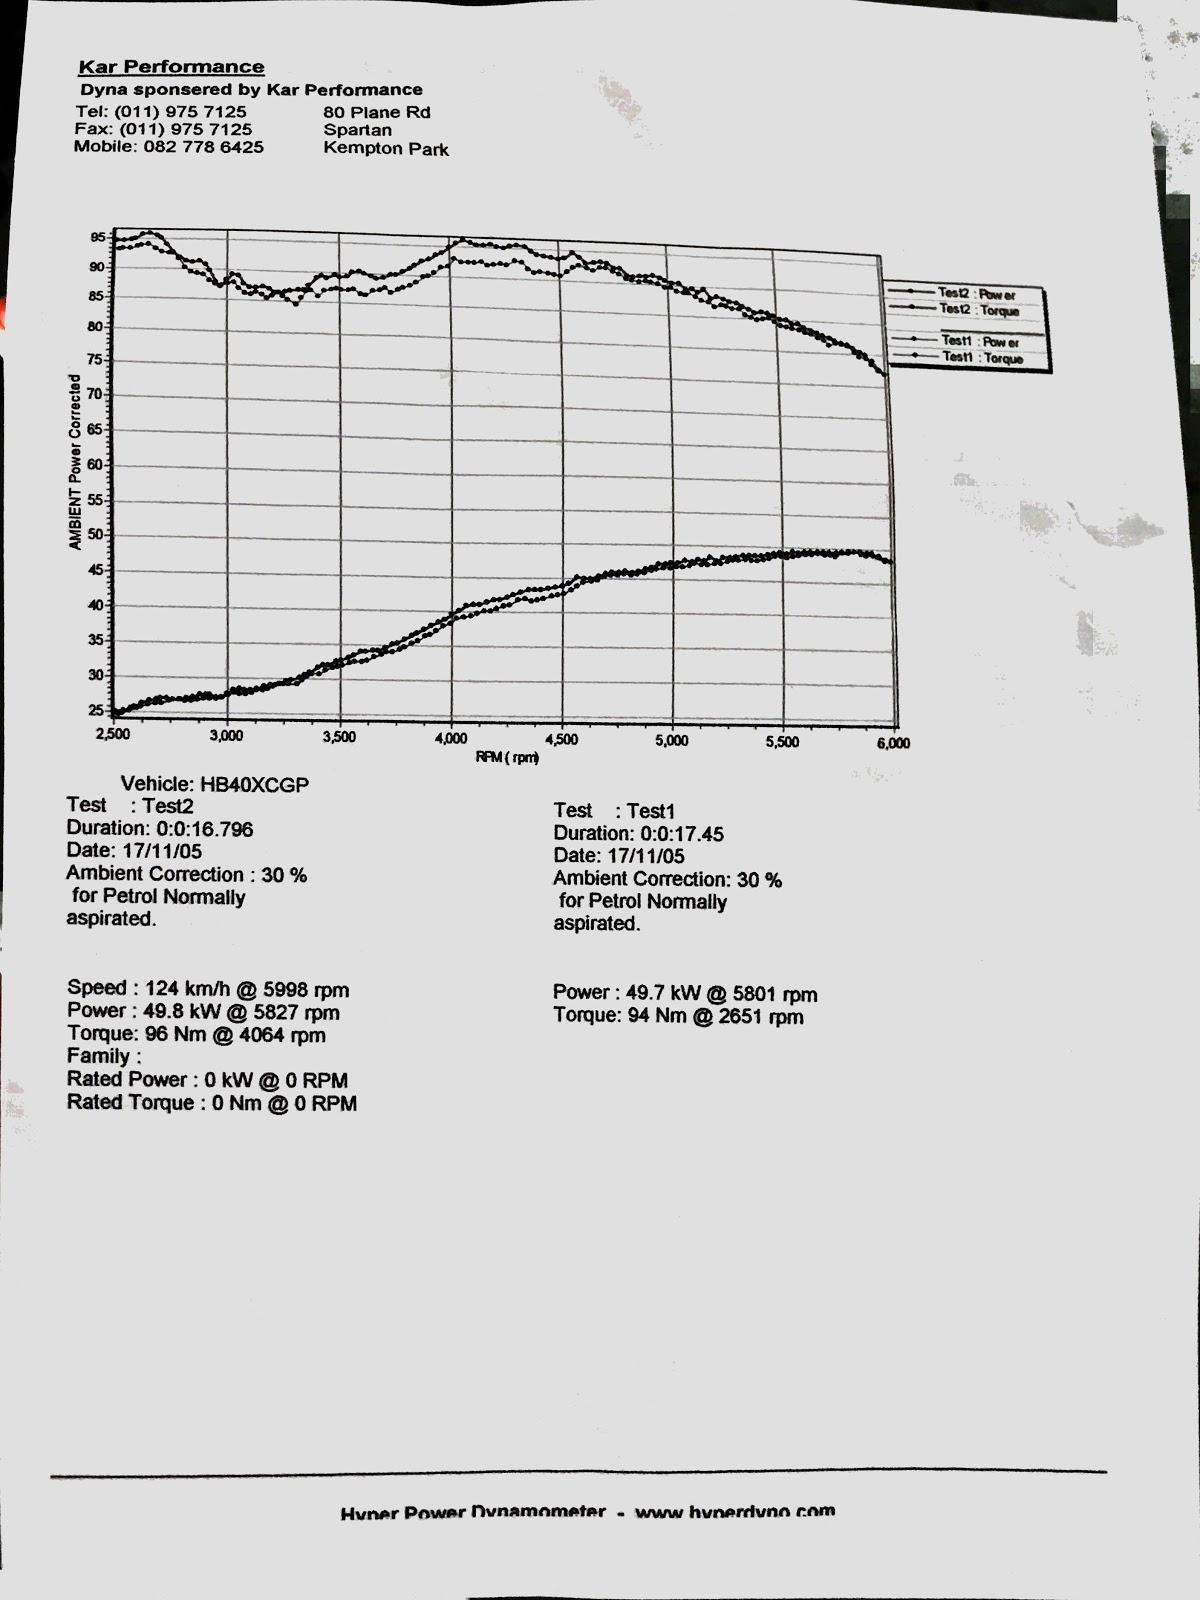 Suzuki Ignis performance